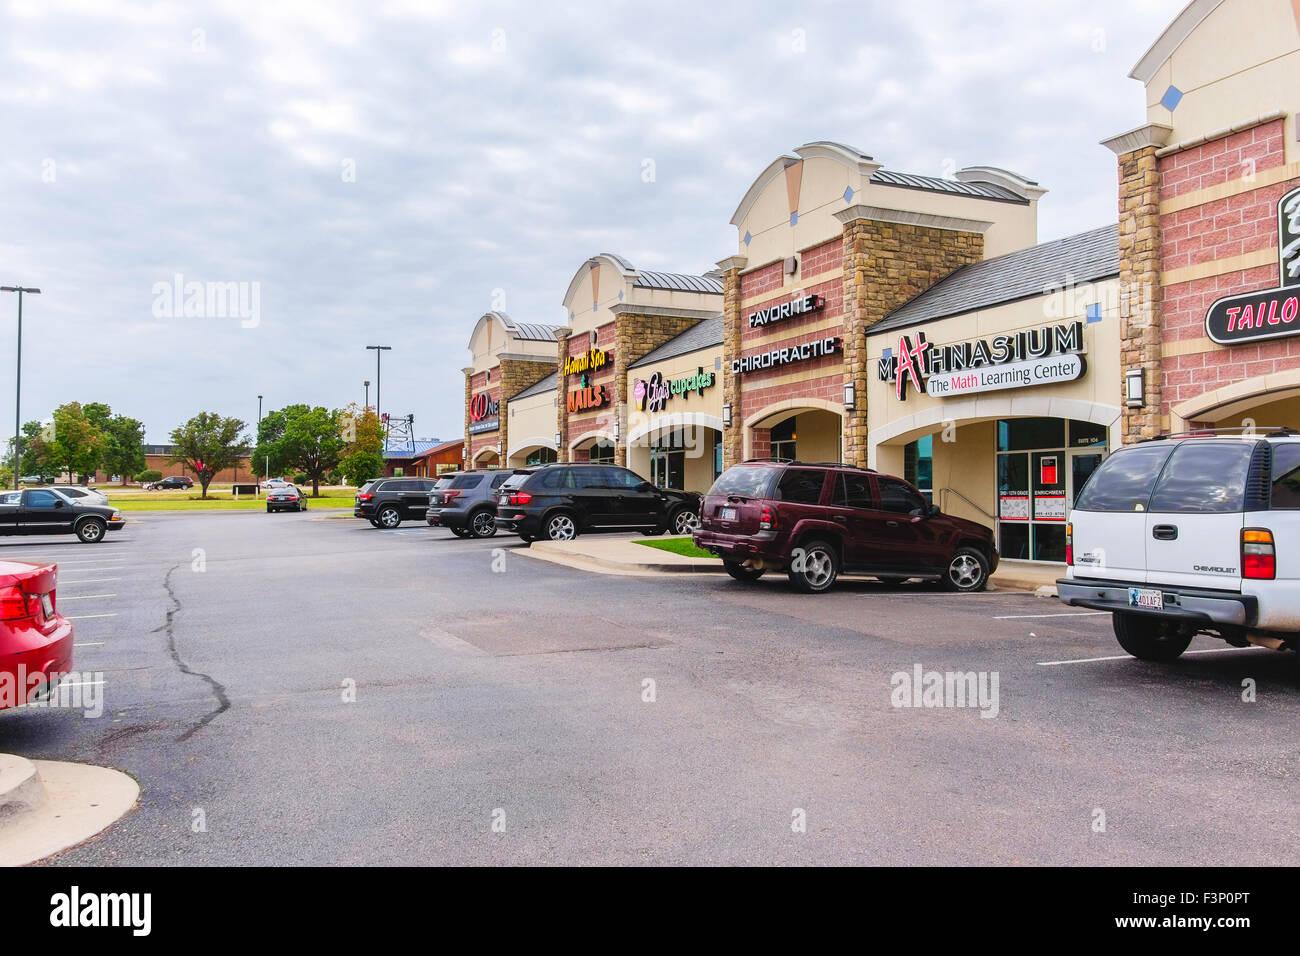 A strip mall exterior in Oklahoma City, Oklahoma, USA. - Stock Image